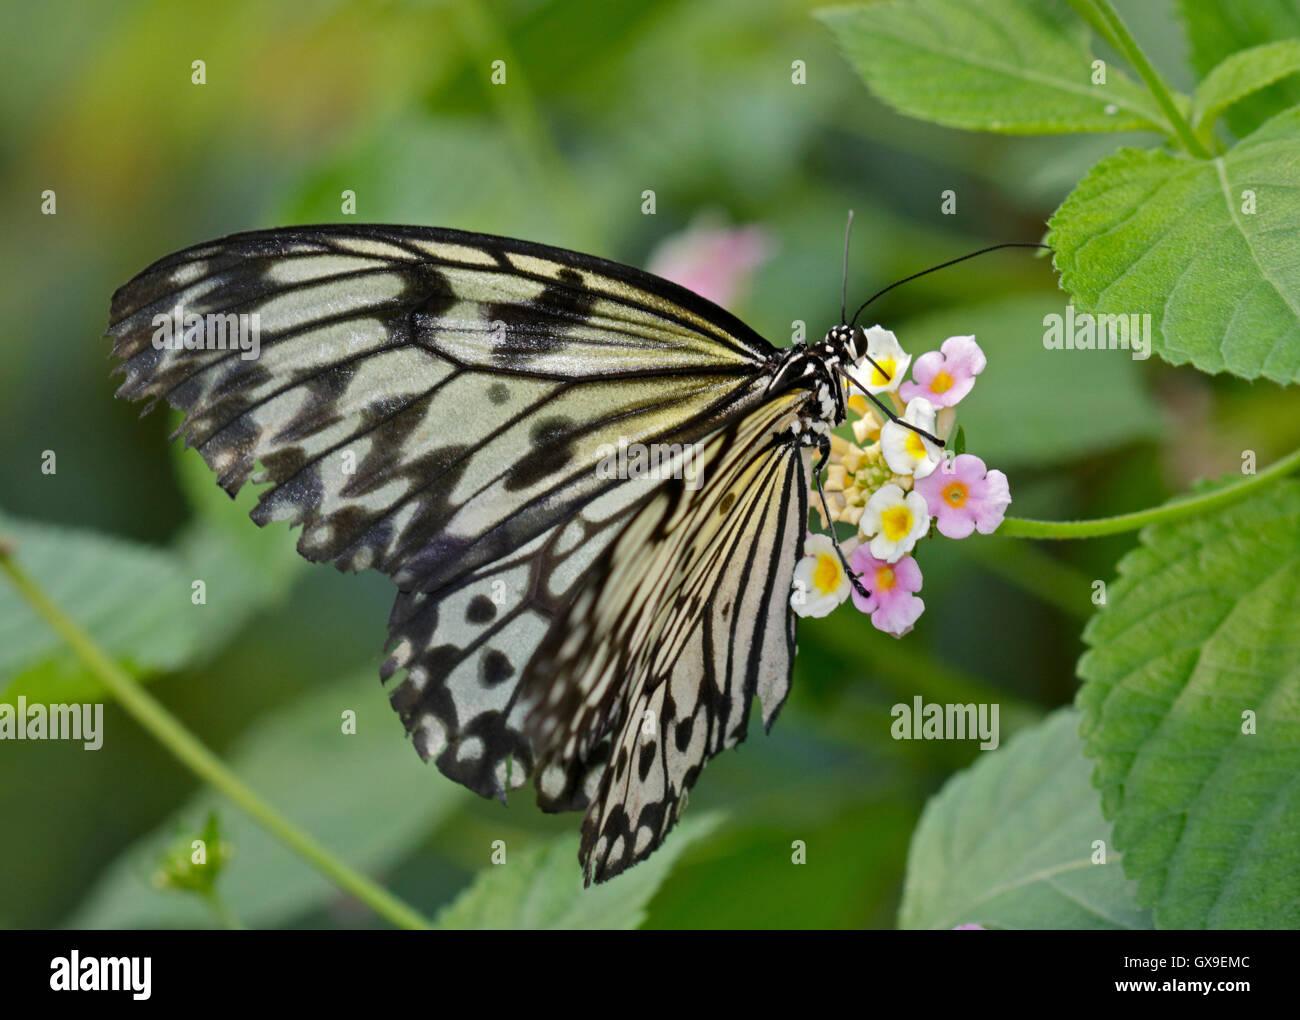 Albero Bianco Ninfa Butterfly (Idea leuconoe) su Lantana fiore Immagini Stock